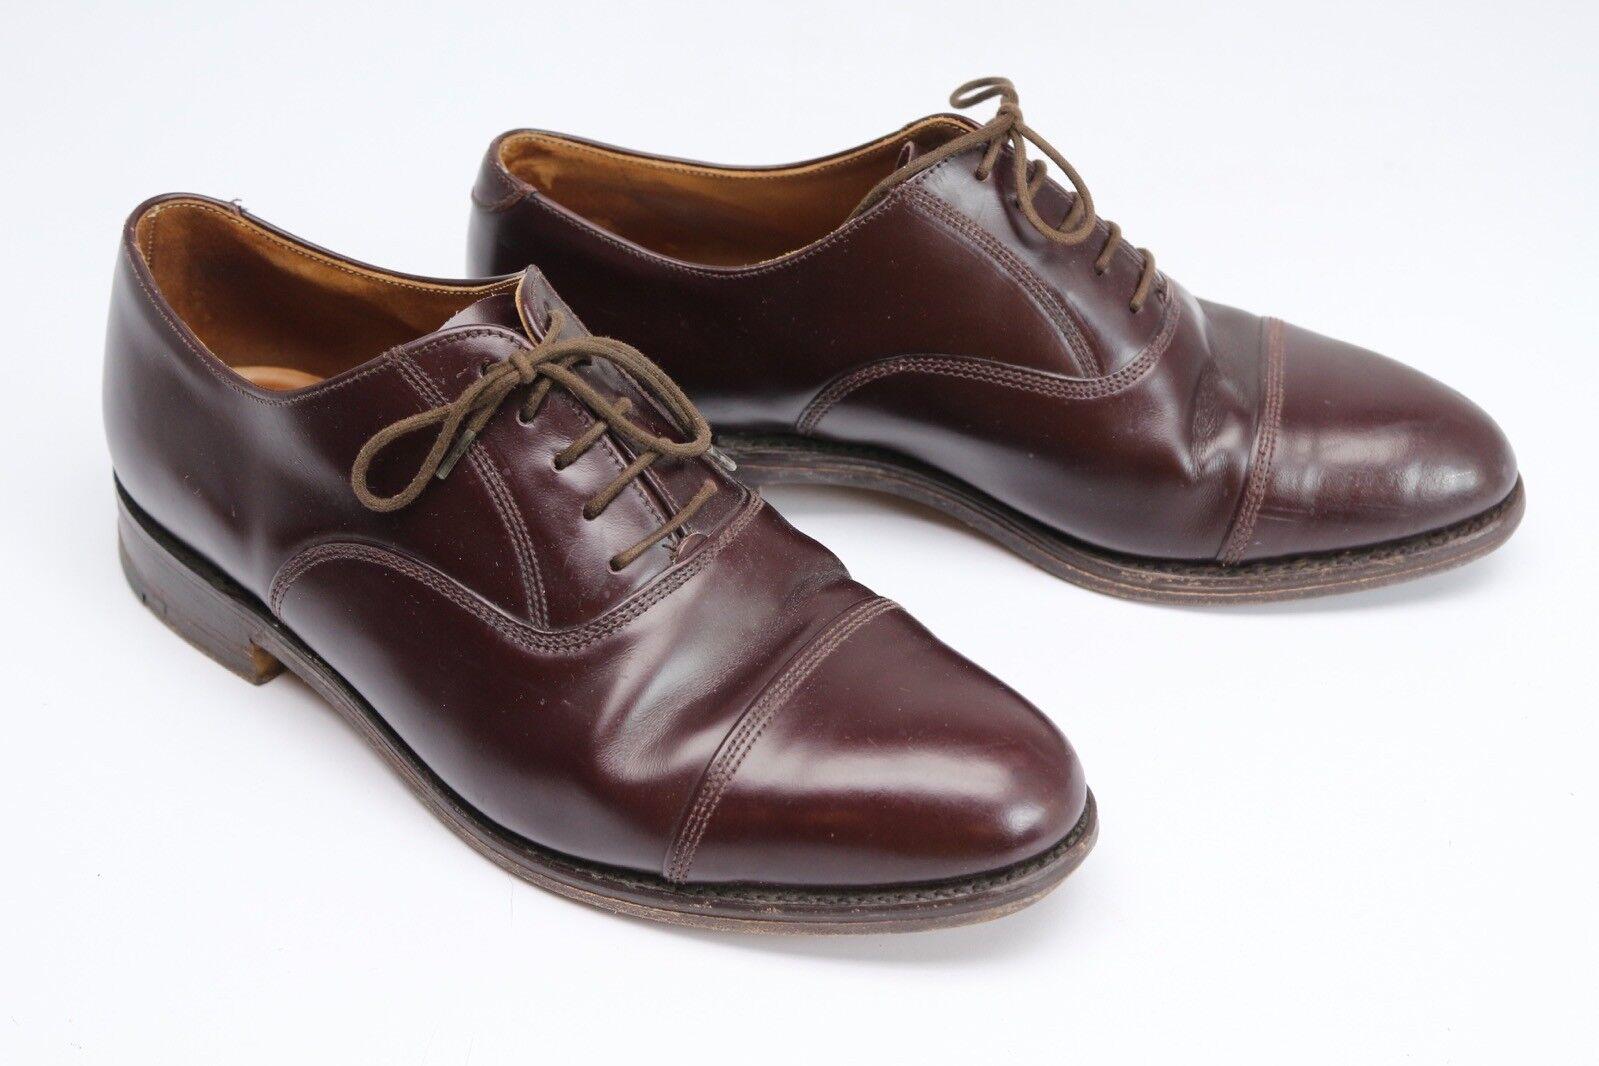 Jones avviolemakers Mens Dress scarpe Alloa  9 D Marronee Leather Cap Toe Oxford Inghilterra  alta qualità generale